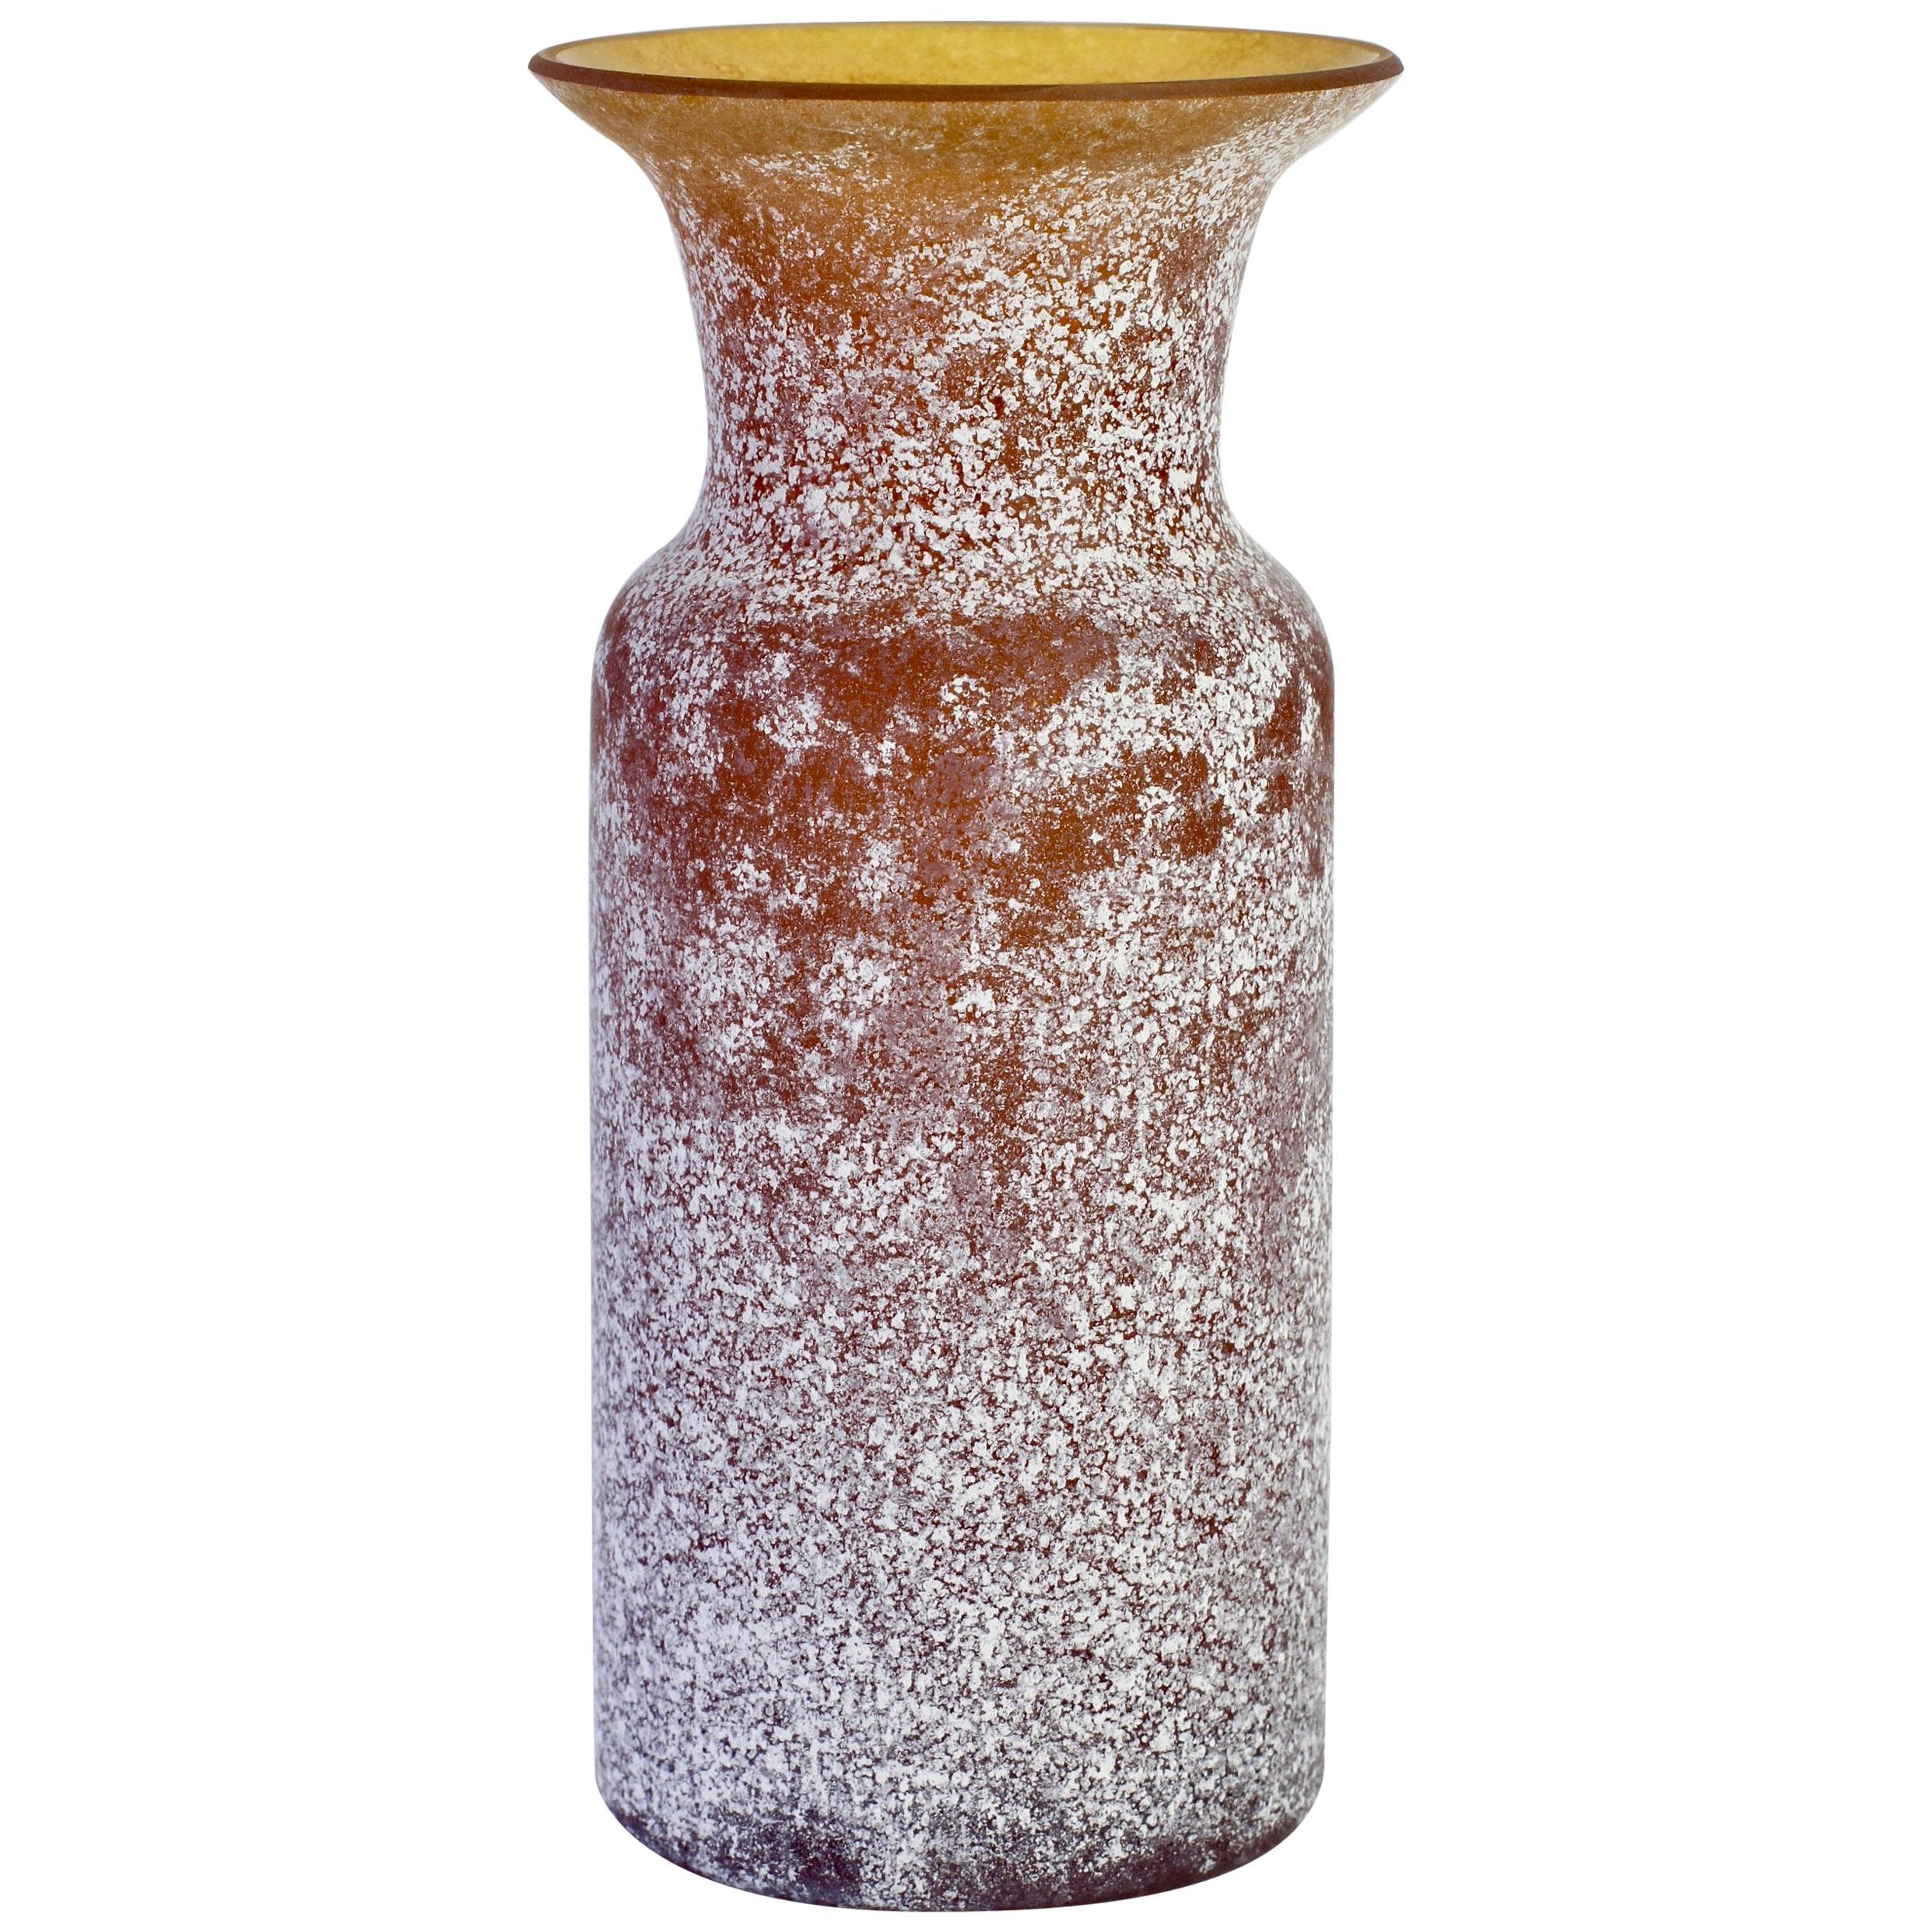 Vintage Seguso Vetri d'Arte Brown 'a Scavo' Murano Glass Vase